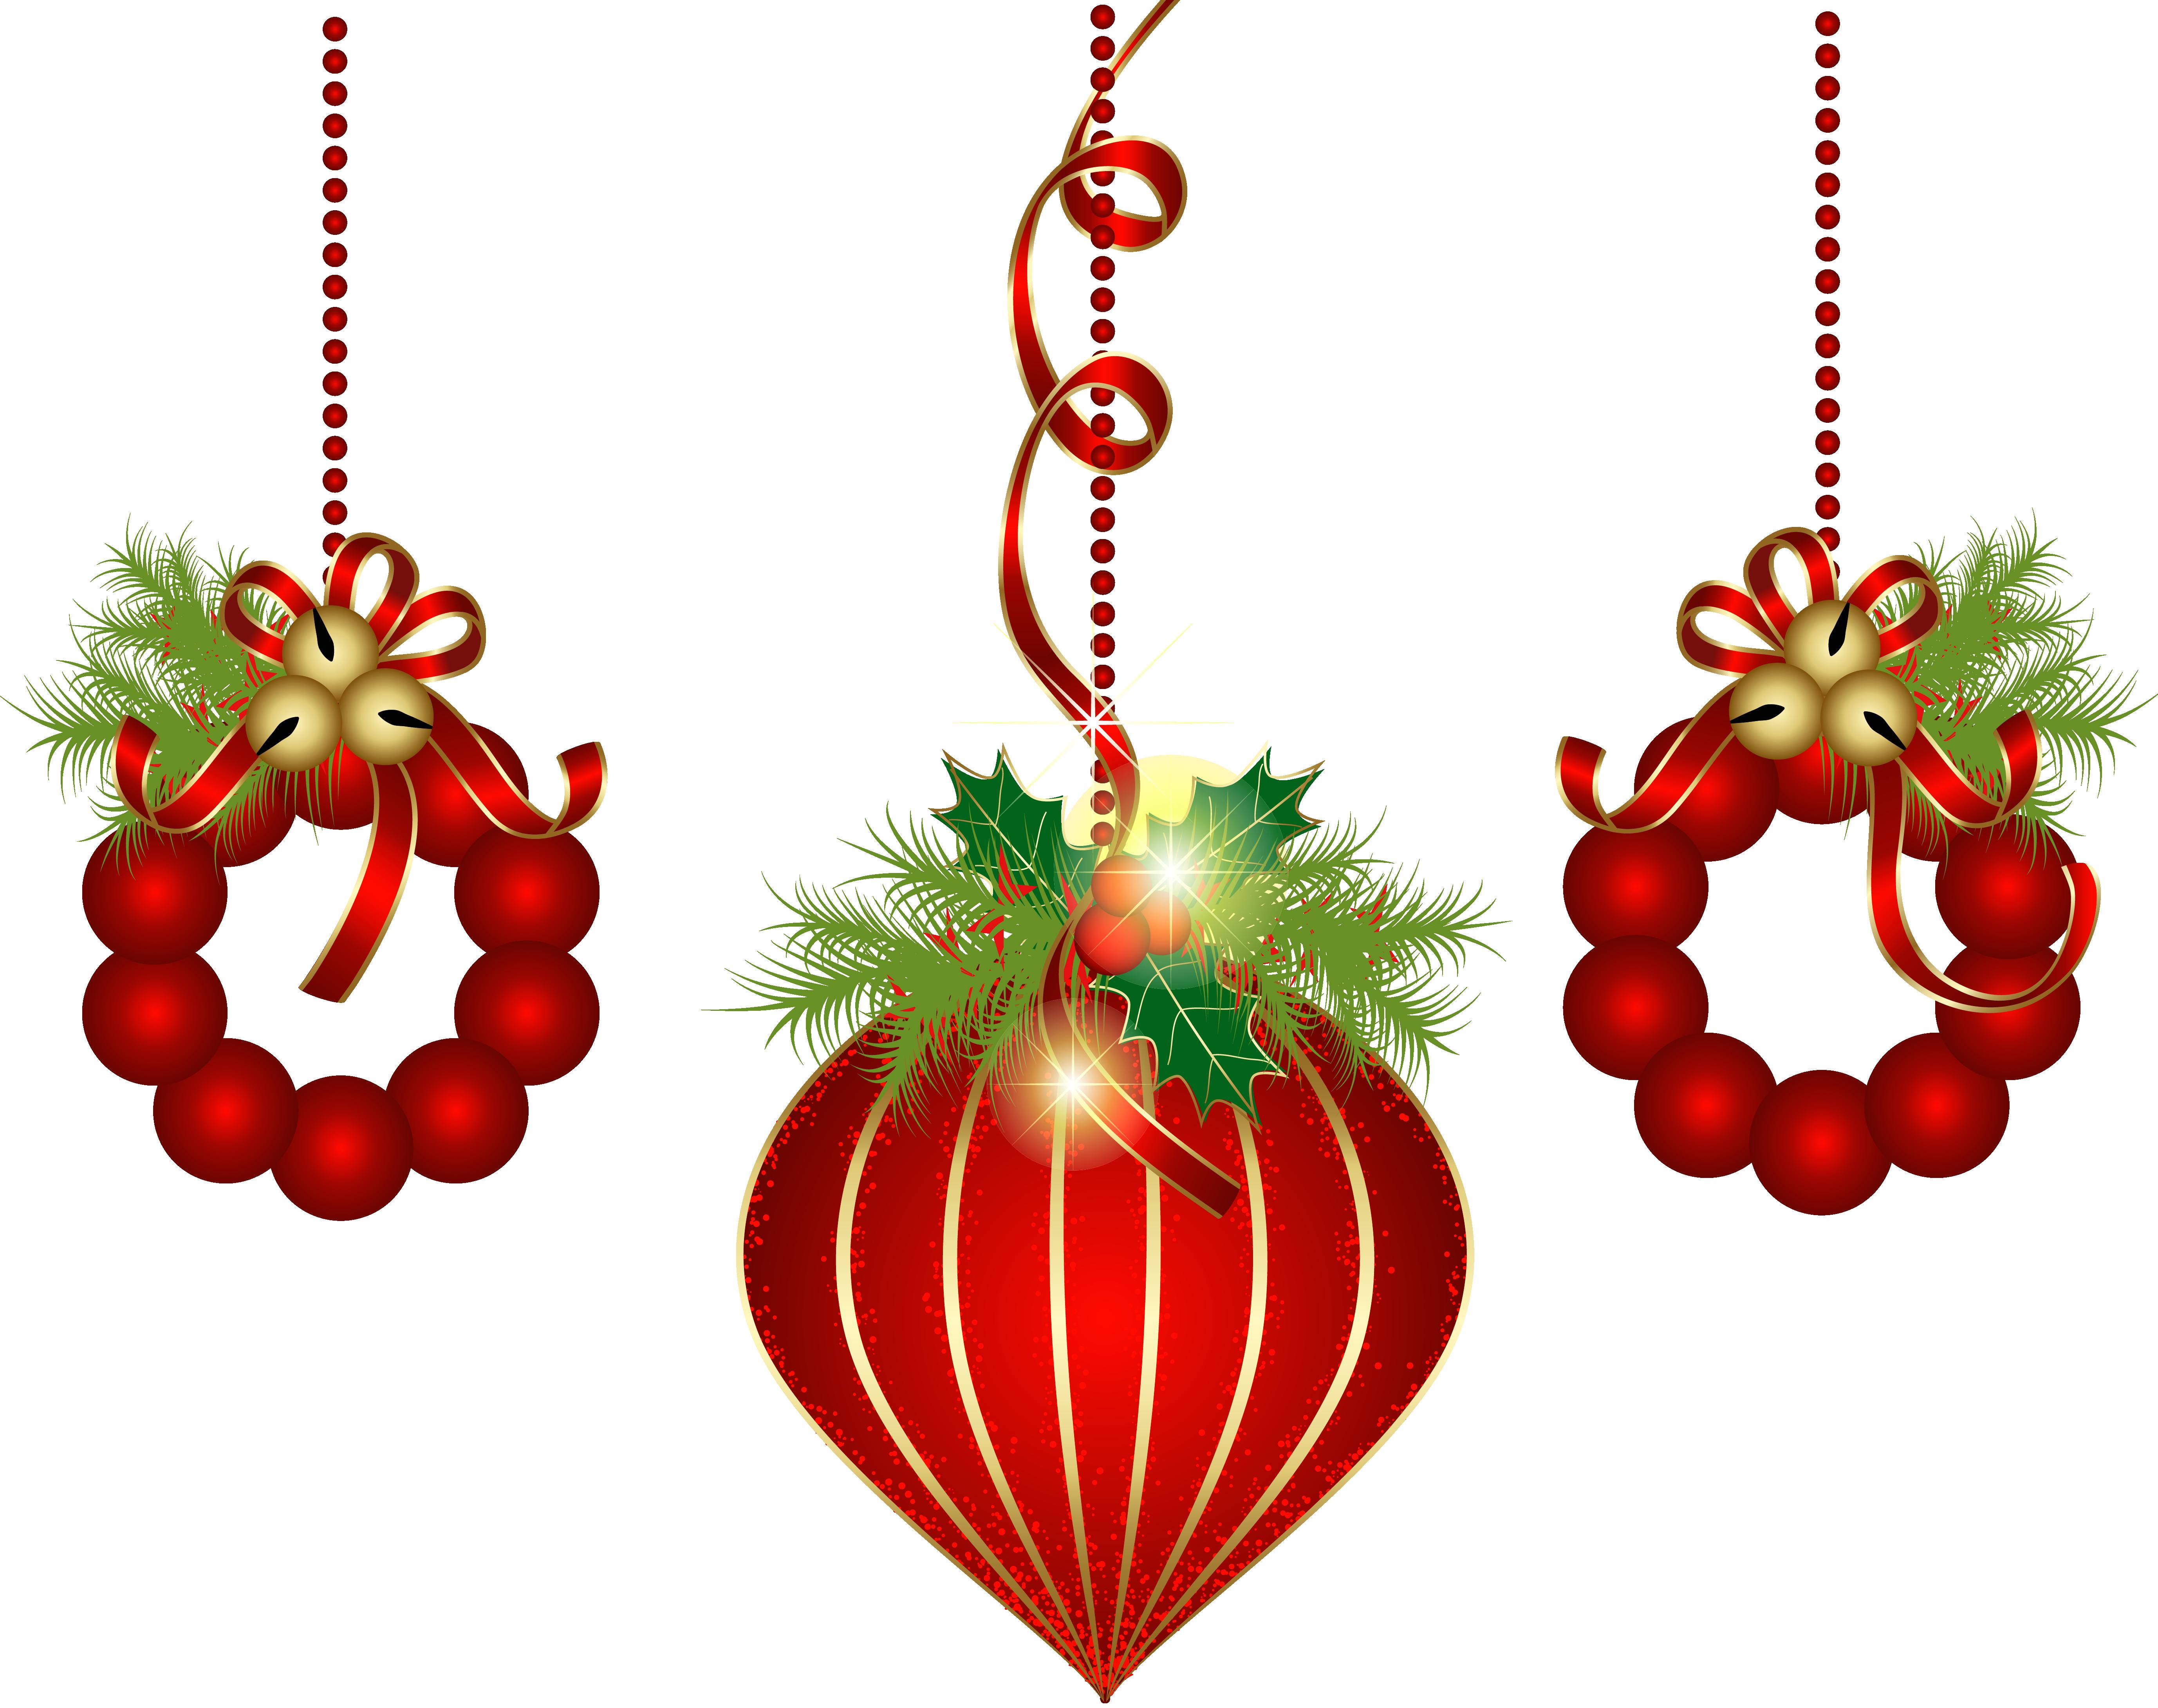 Christmas Clipart Transparent.Christmas Clipart Transparent Background Christmas